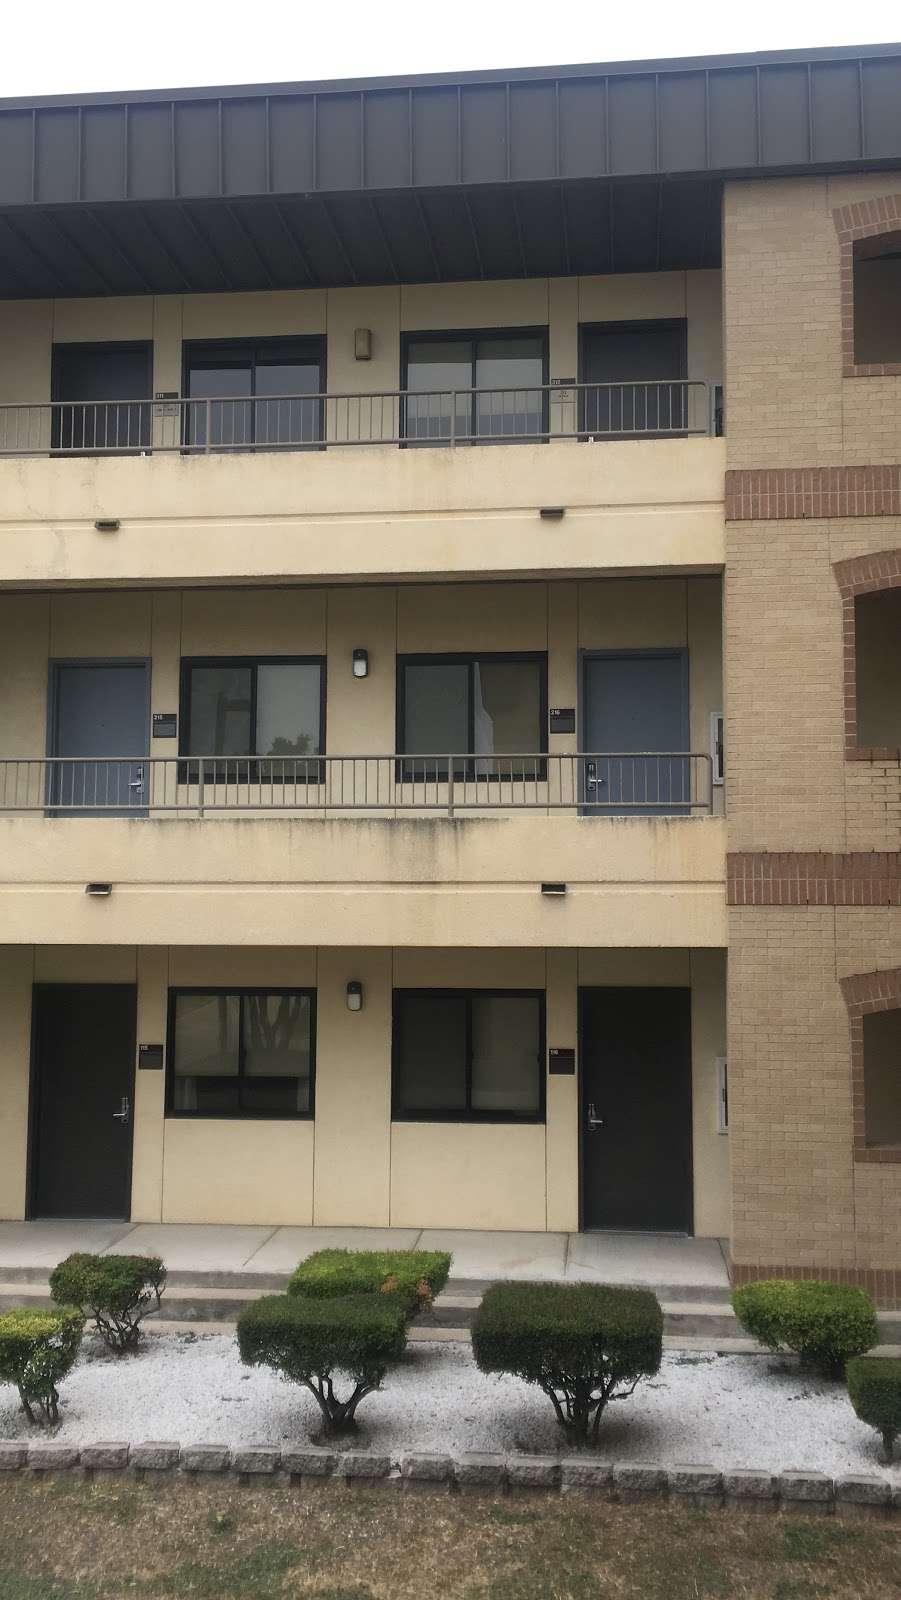 Gateway Lodge 7435 (IAAFA Inn) - lodging  | Photo 1 of 10 | Address: Craw Ave, Lackland AFB, TX 78236, USA | Phone: (210) 675-5050